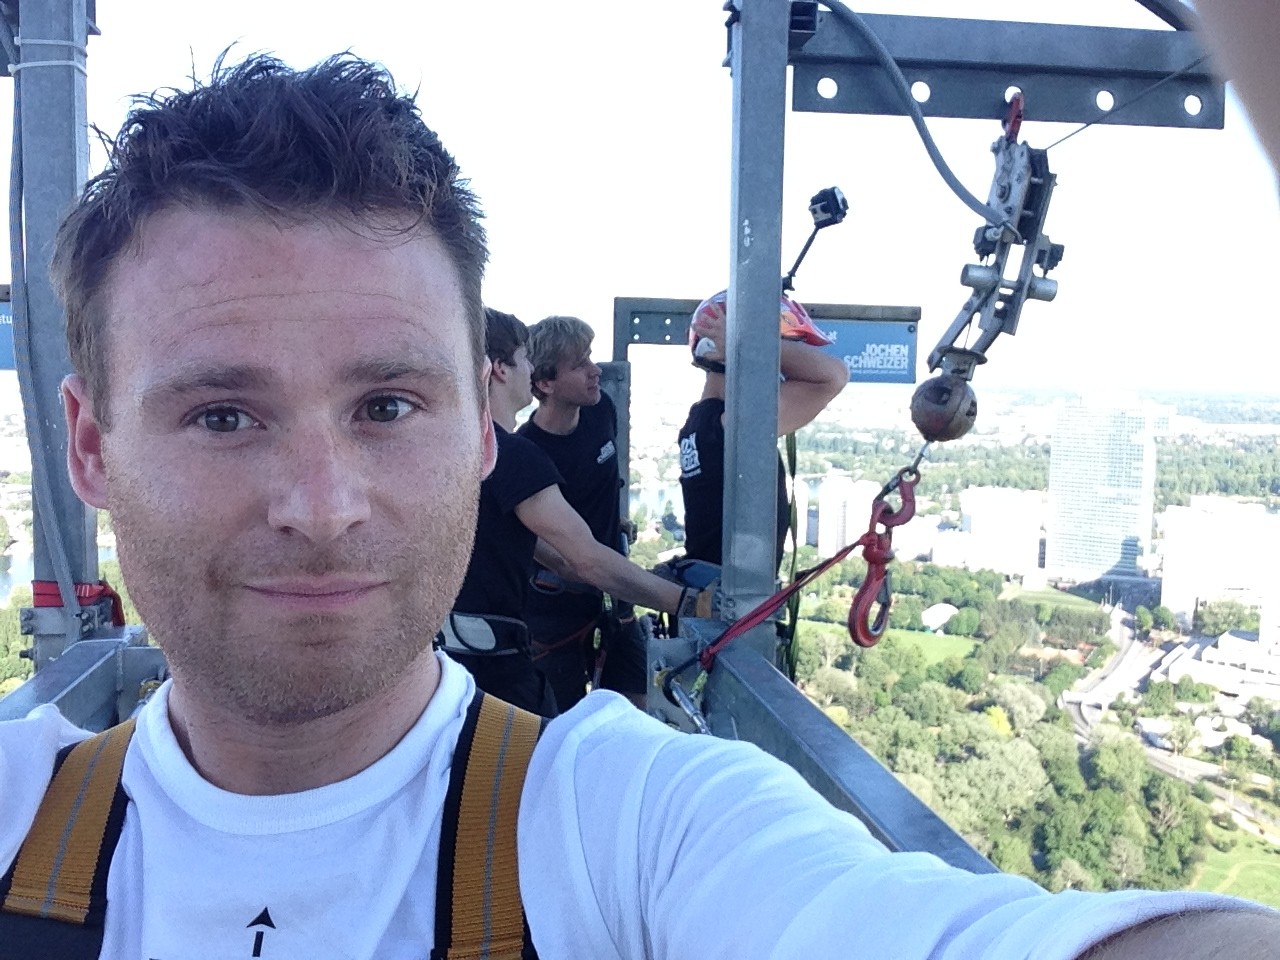 Sprung Donauturm